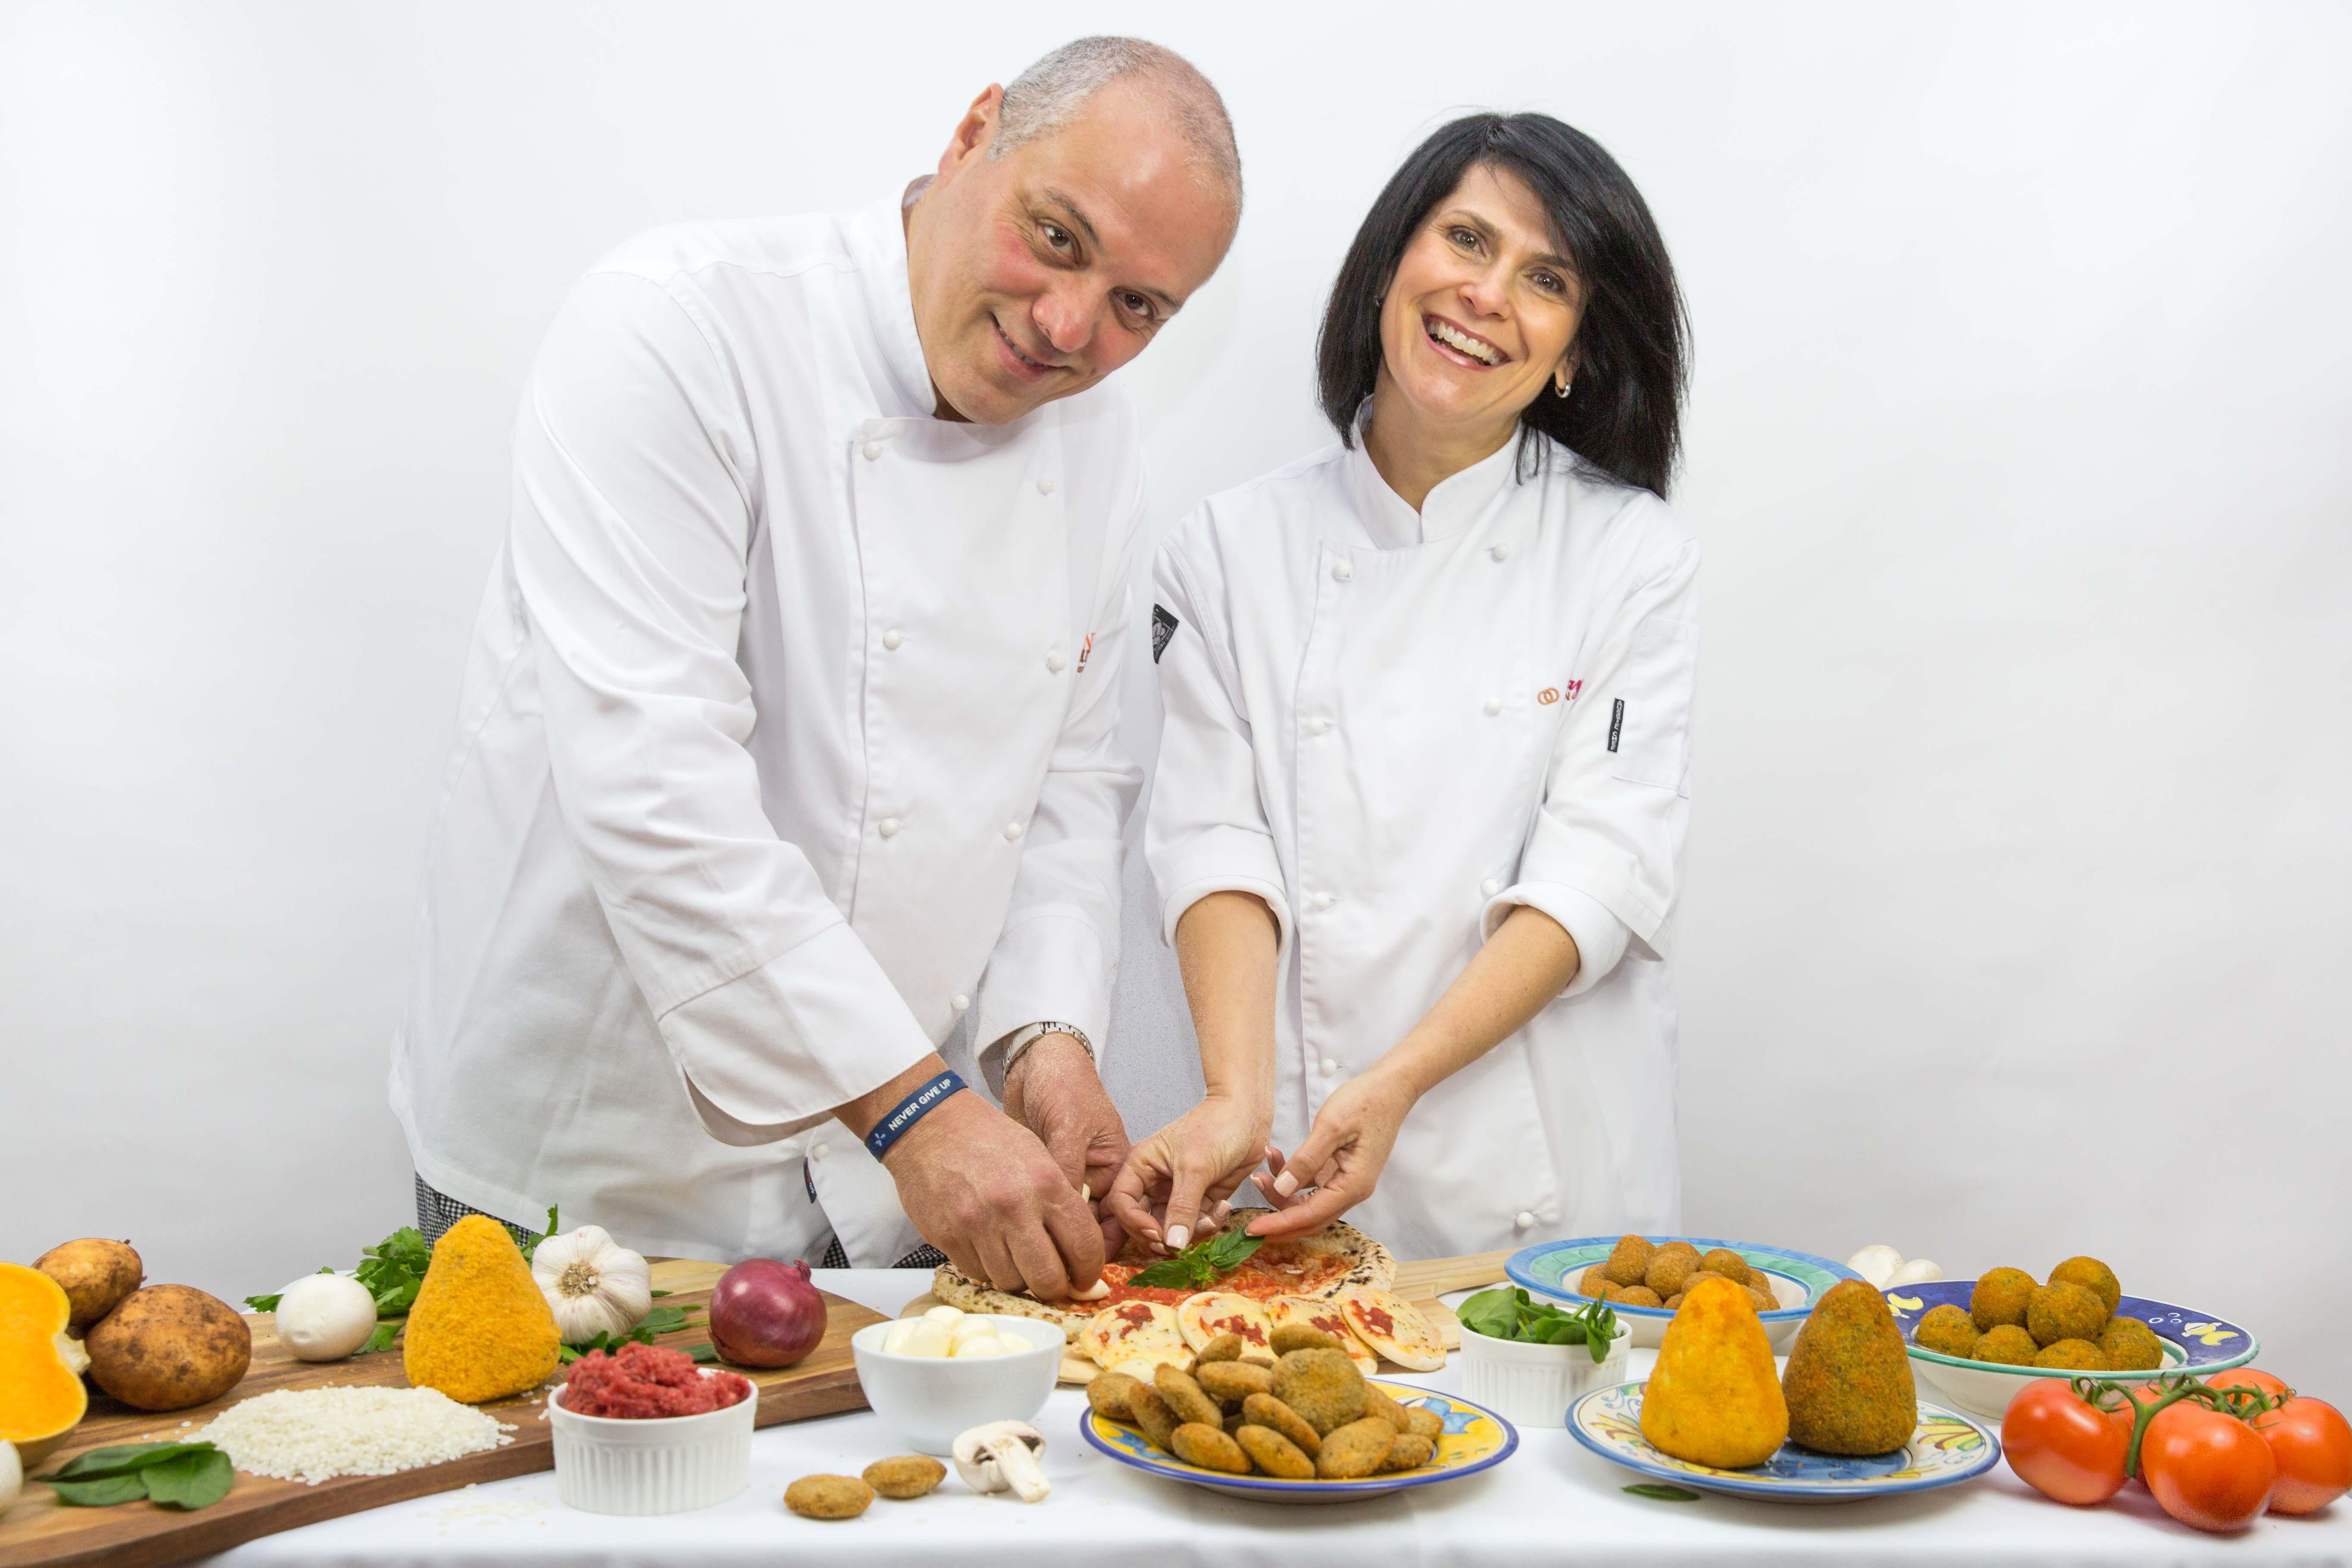 riccardo-siligato-josanne-rizzo-food-art-distribution